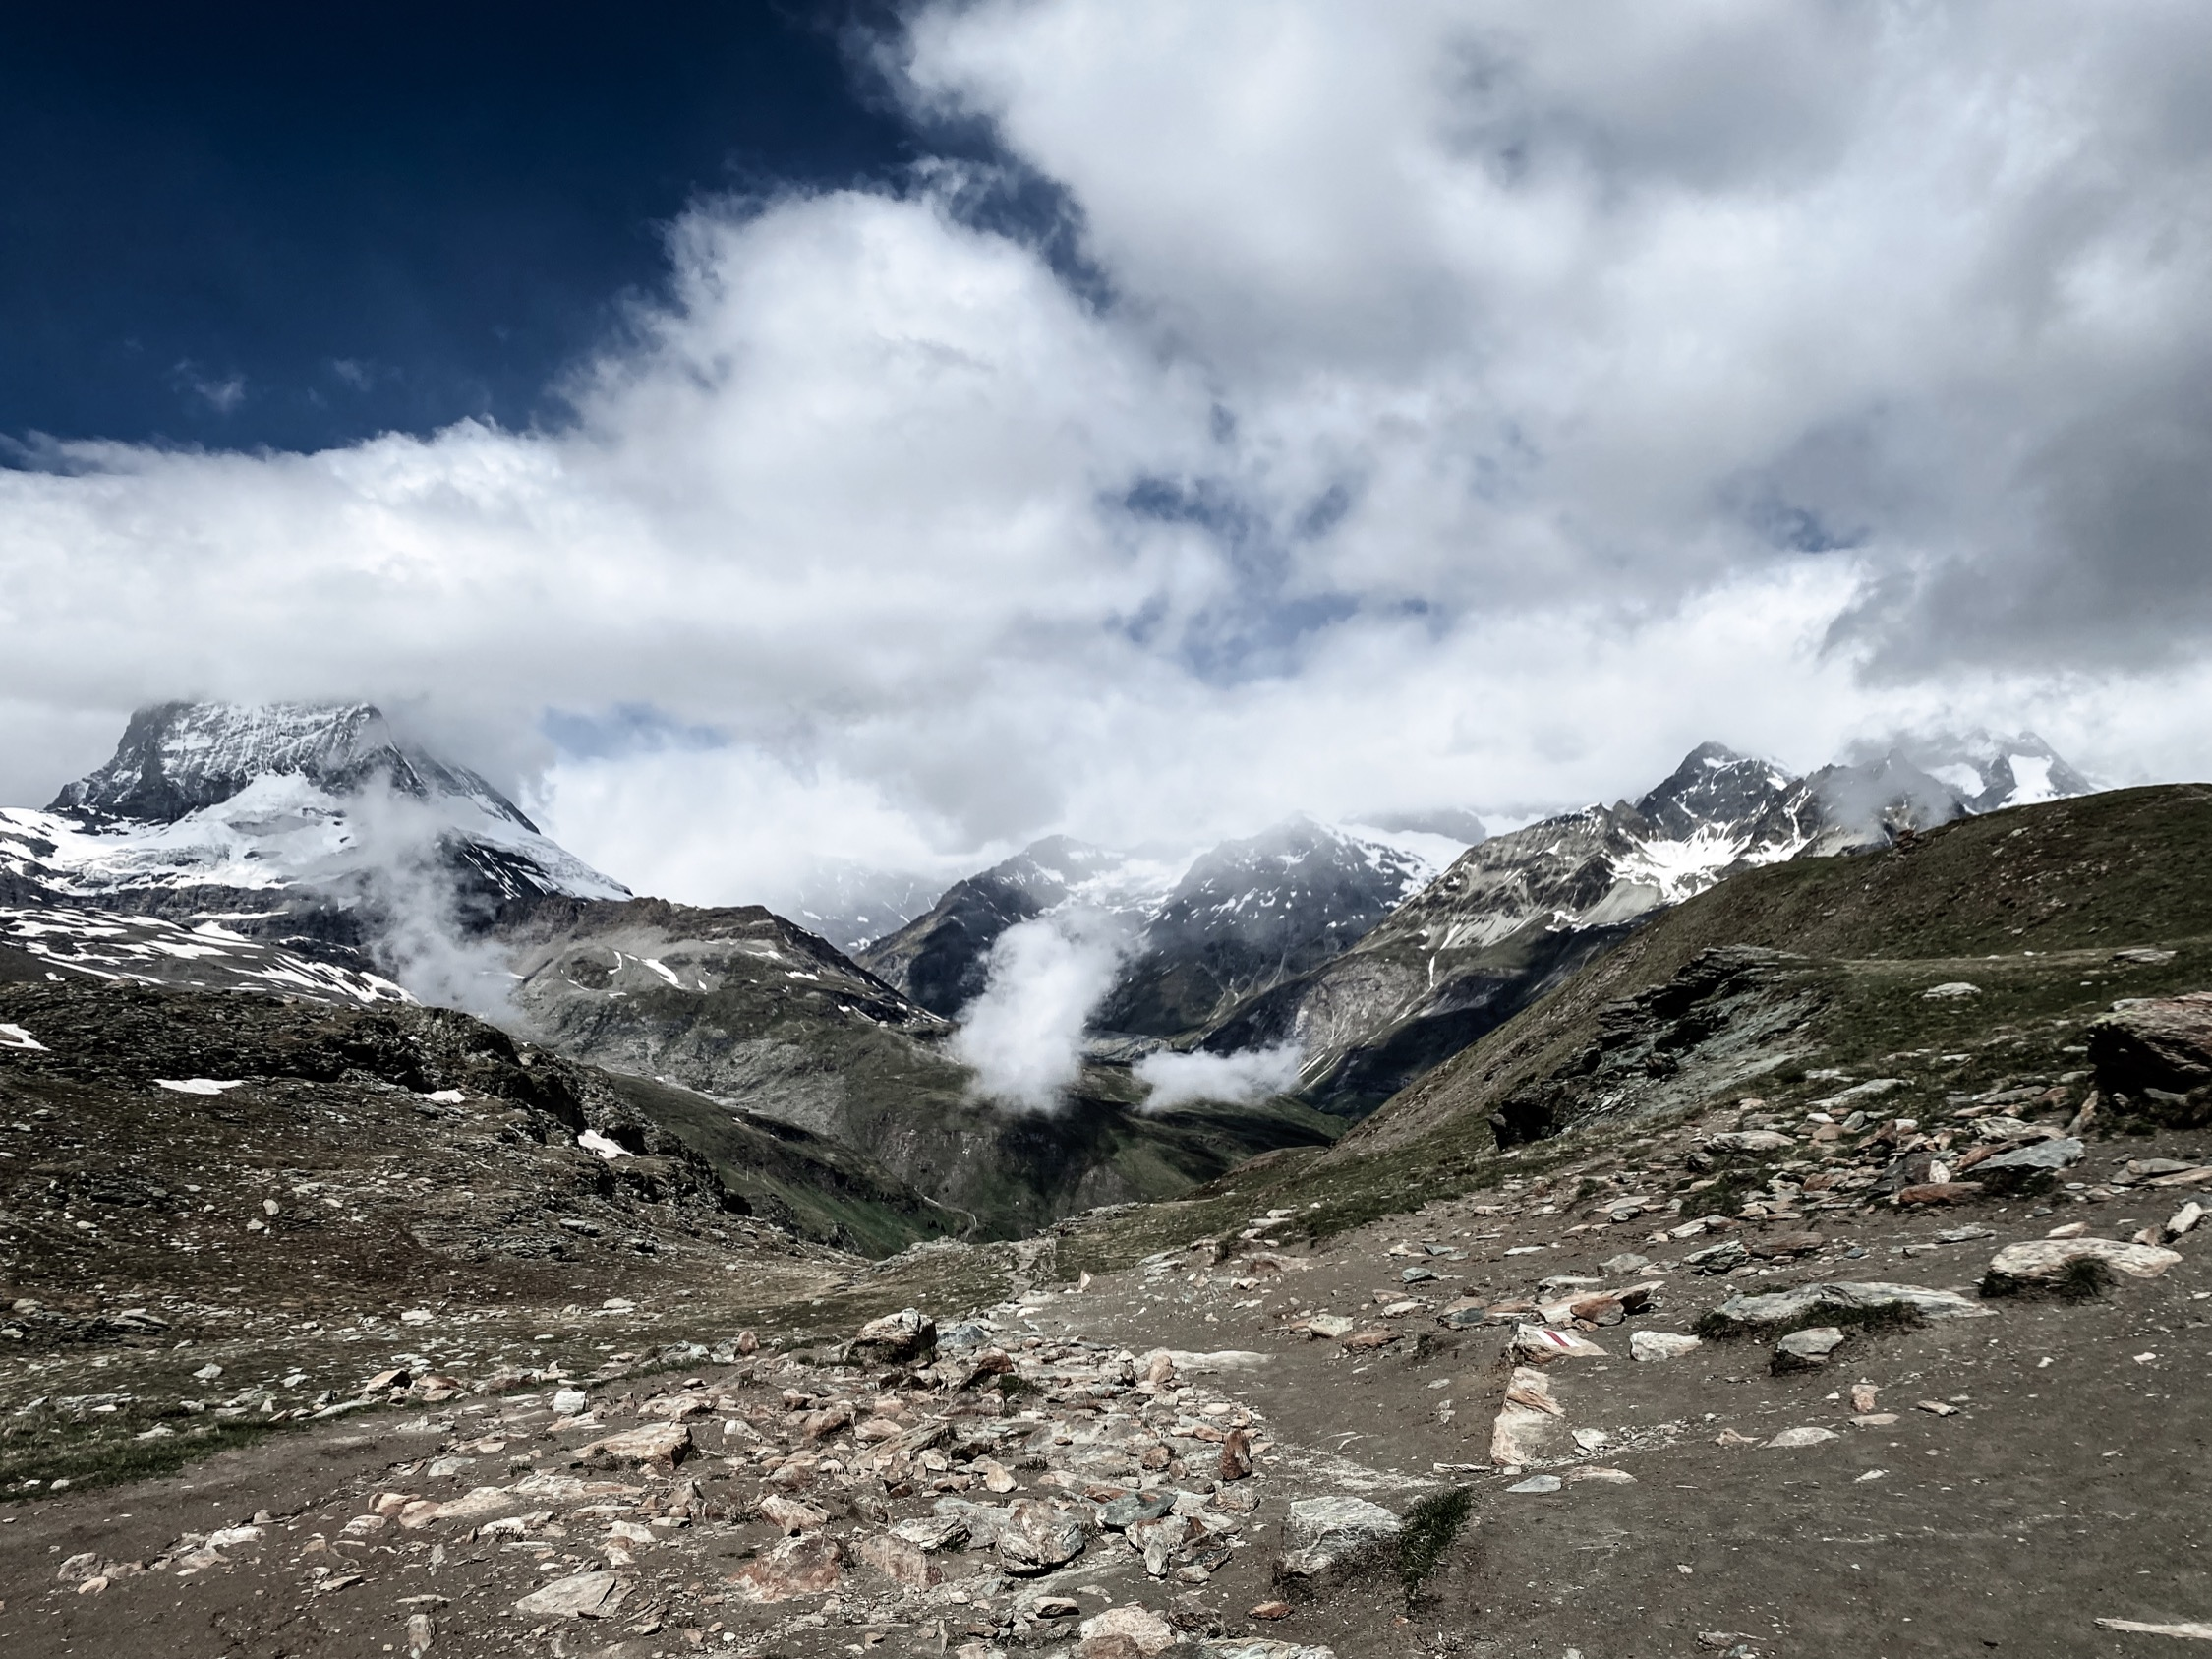 Hiking day at Gornergrat, organised by Riffelalp Resort 2222m